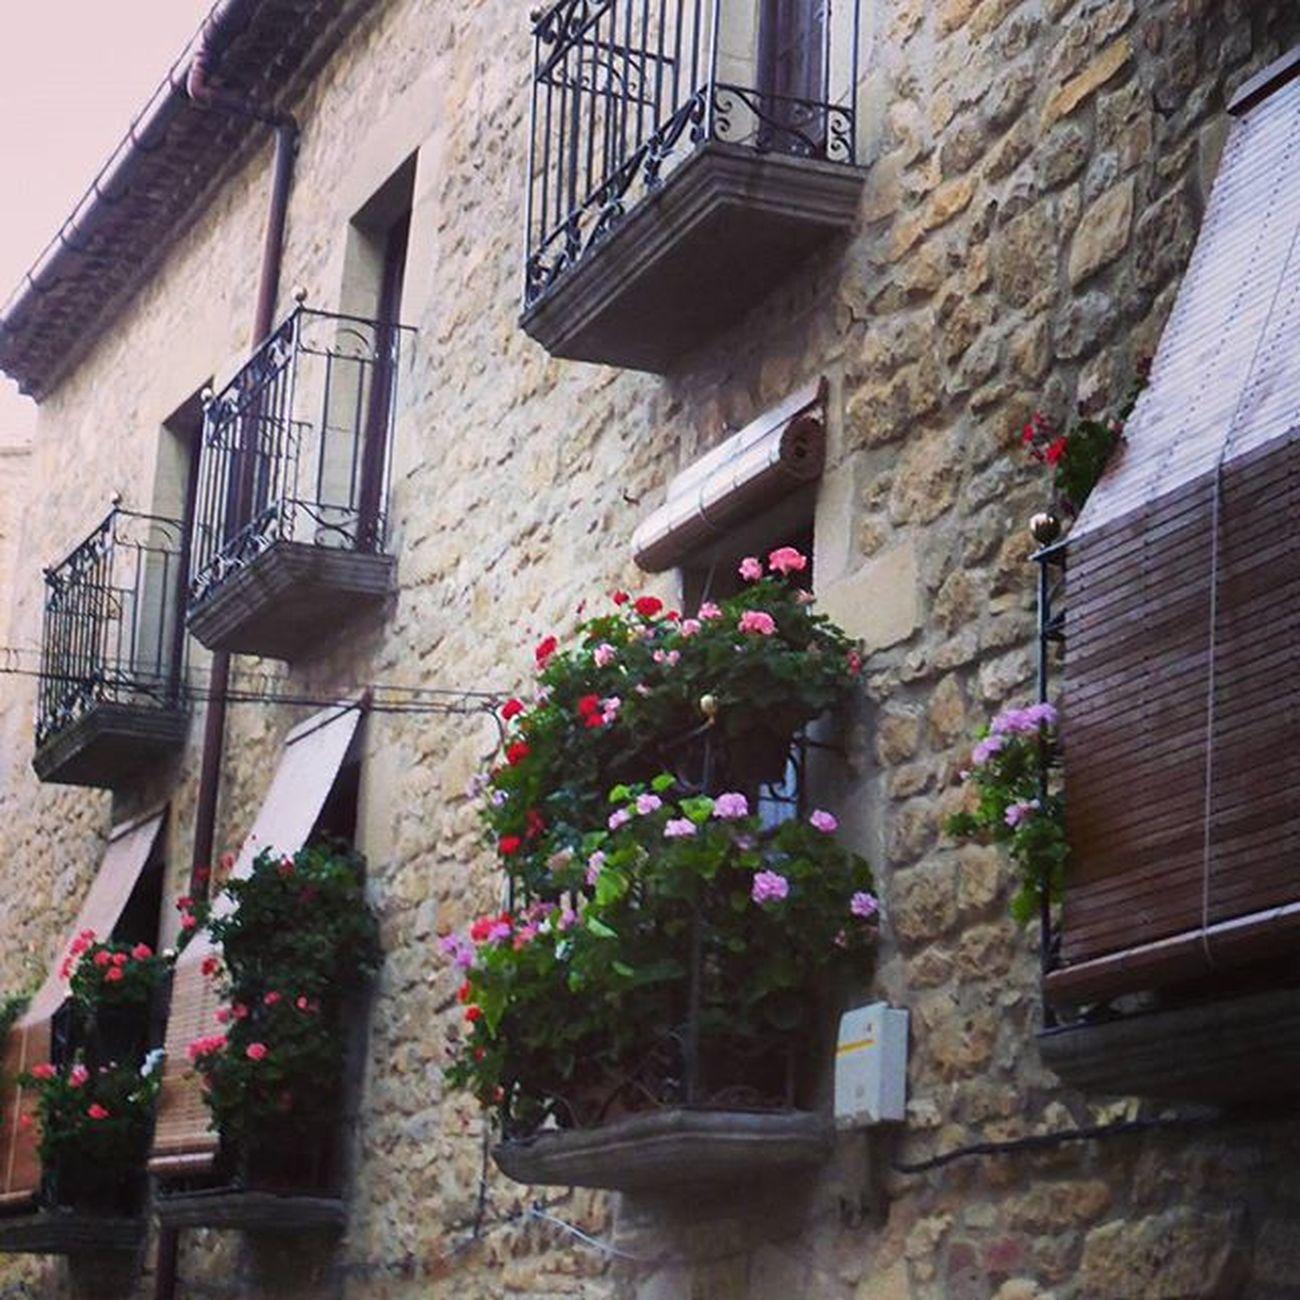 Paseando. Sosdelreycatolico Igerszgz Civitur Igersaragon YovisitoCincoVillas Aragón turismo travel flowers